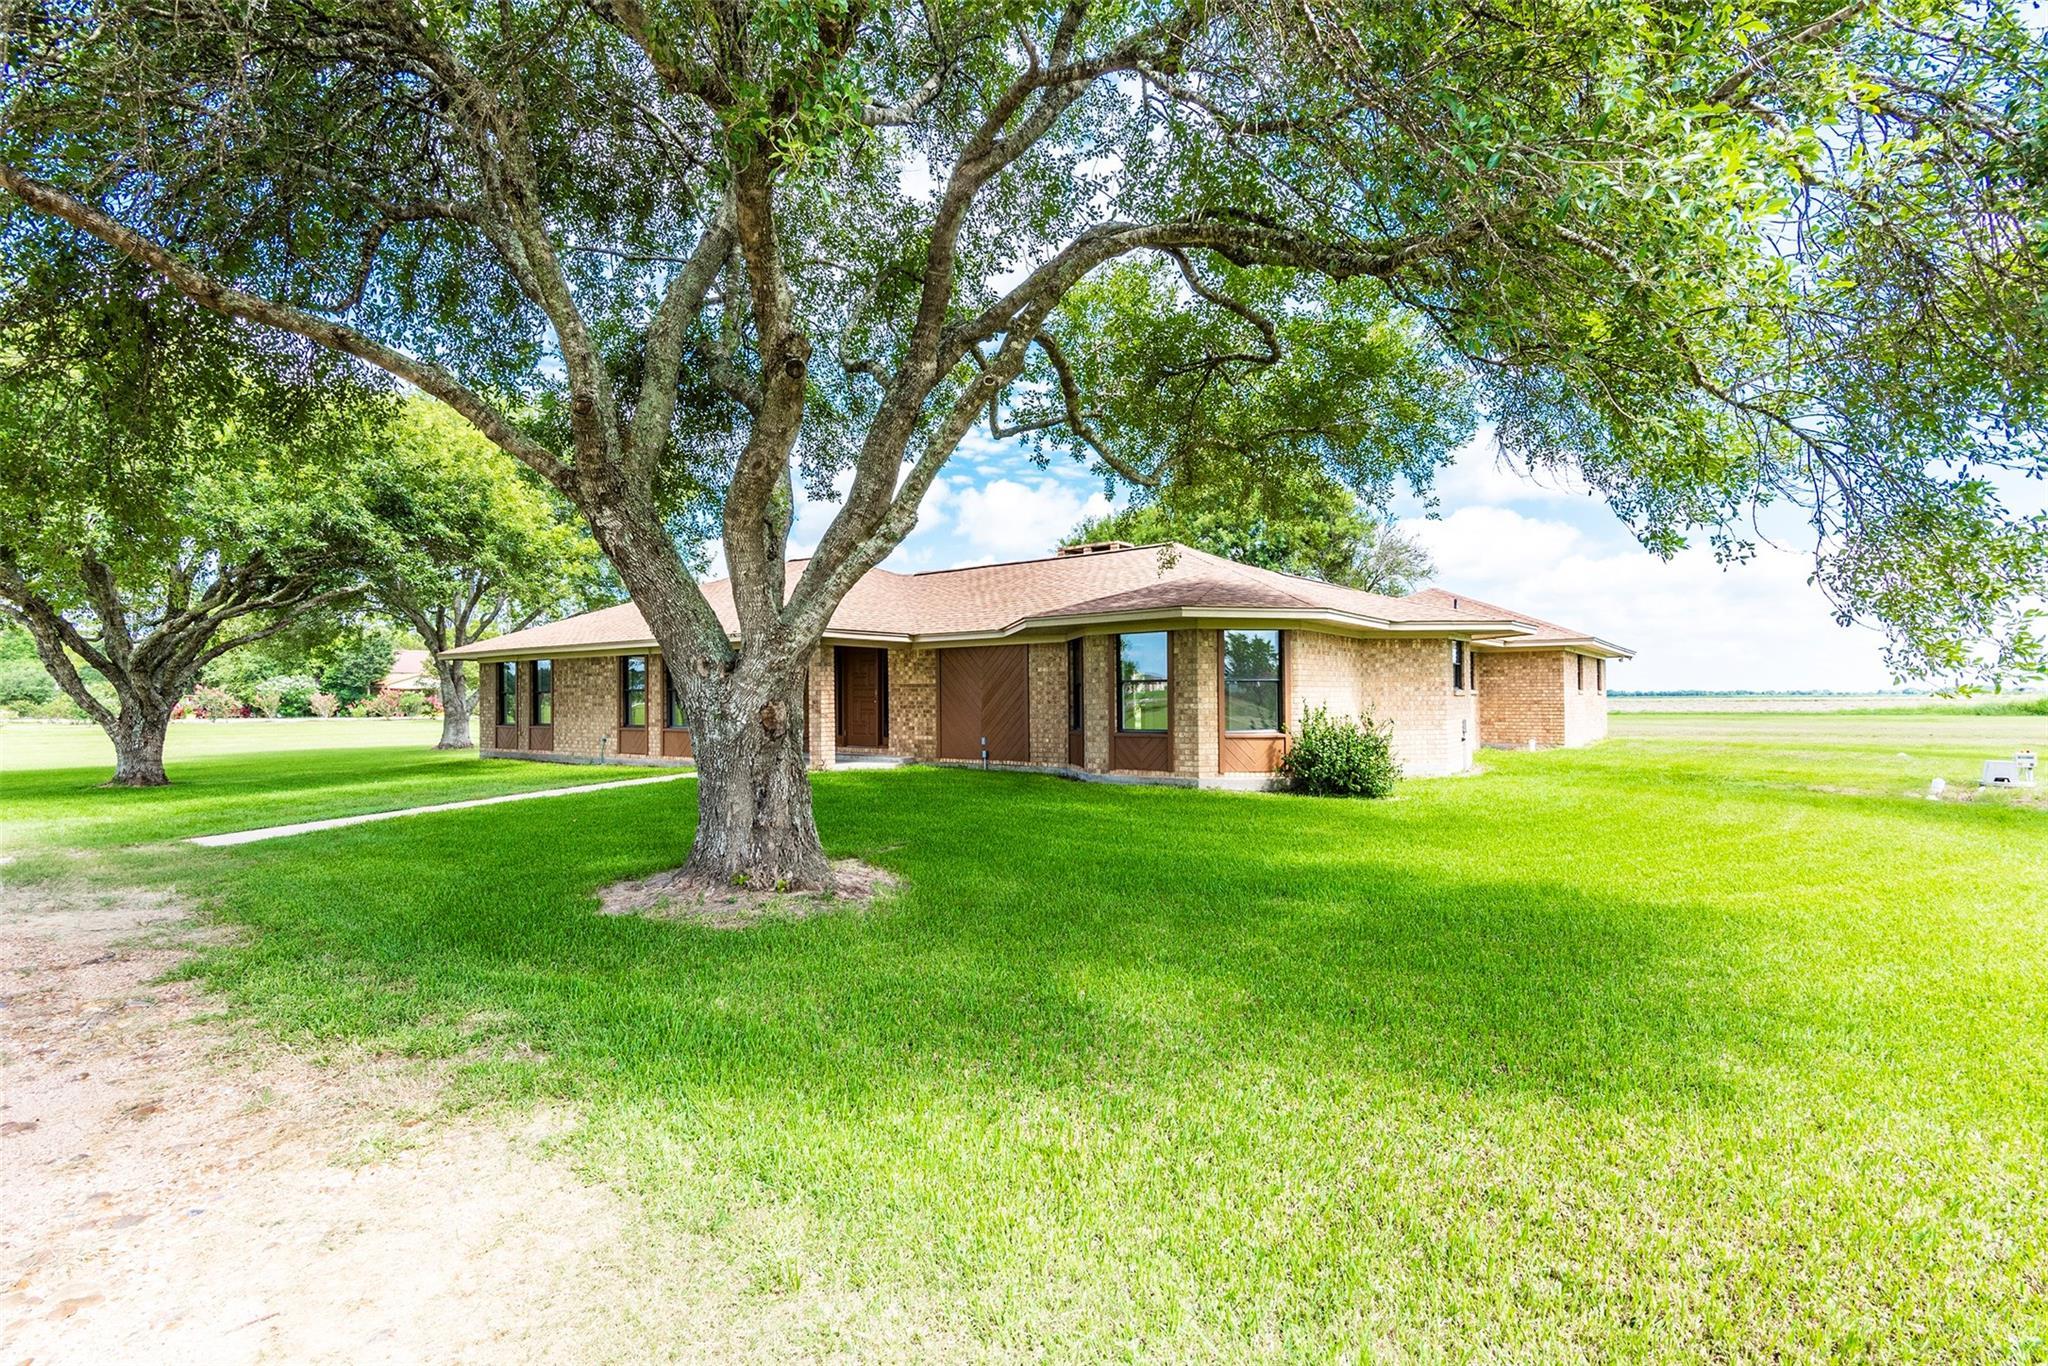 1542 Fm 1300 Road Property Photo - El Campo, TX real estate listing